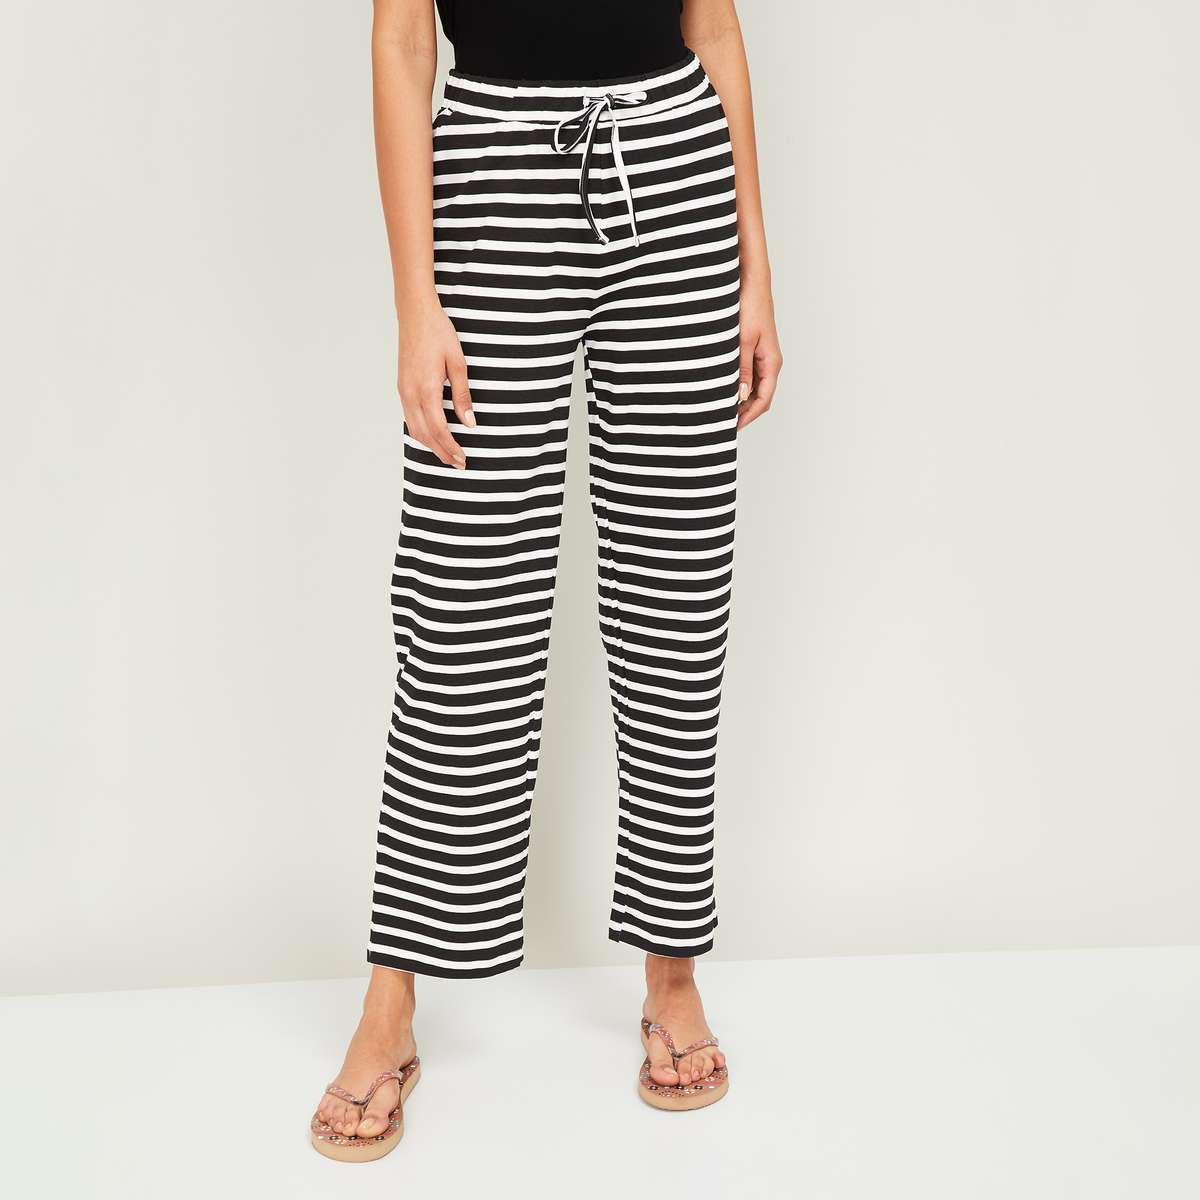 2.GINGER Women Striped Pyjama Pants